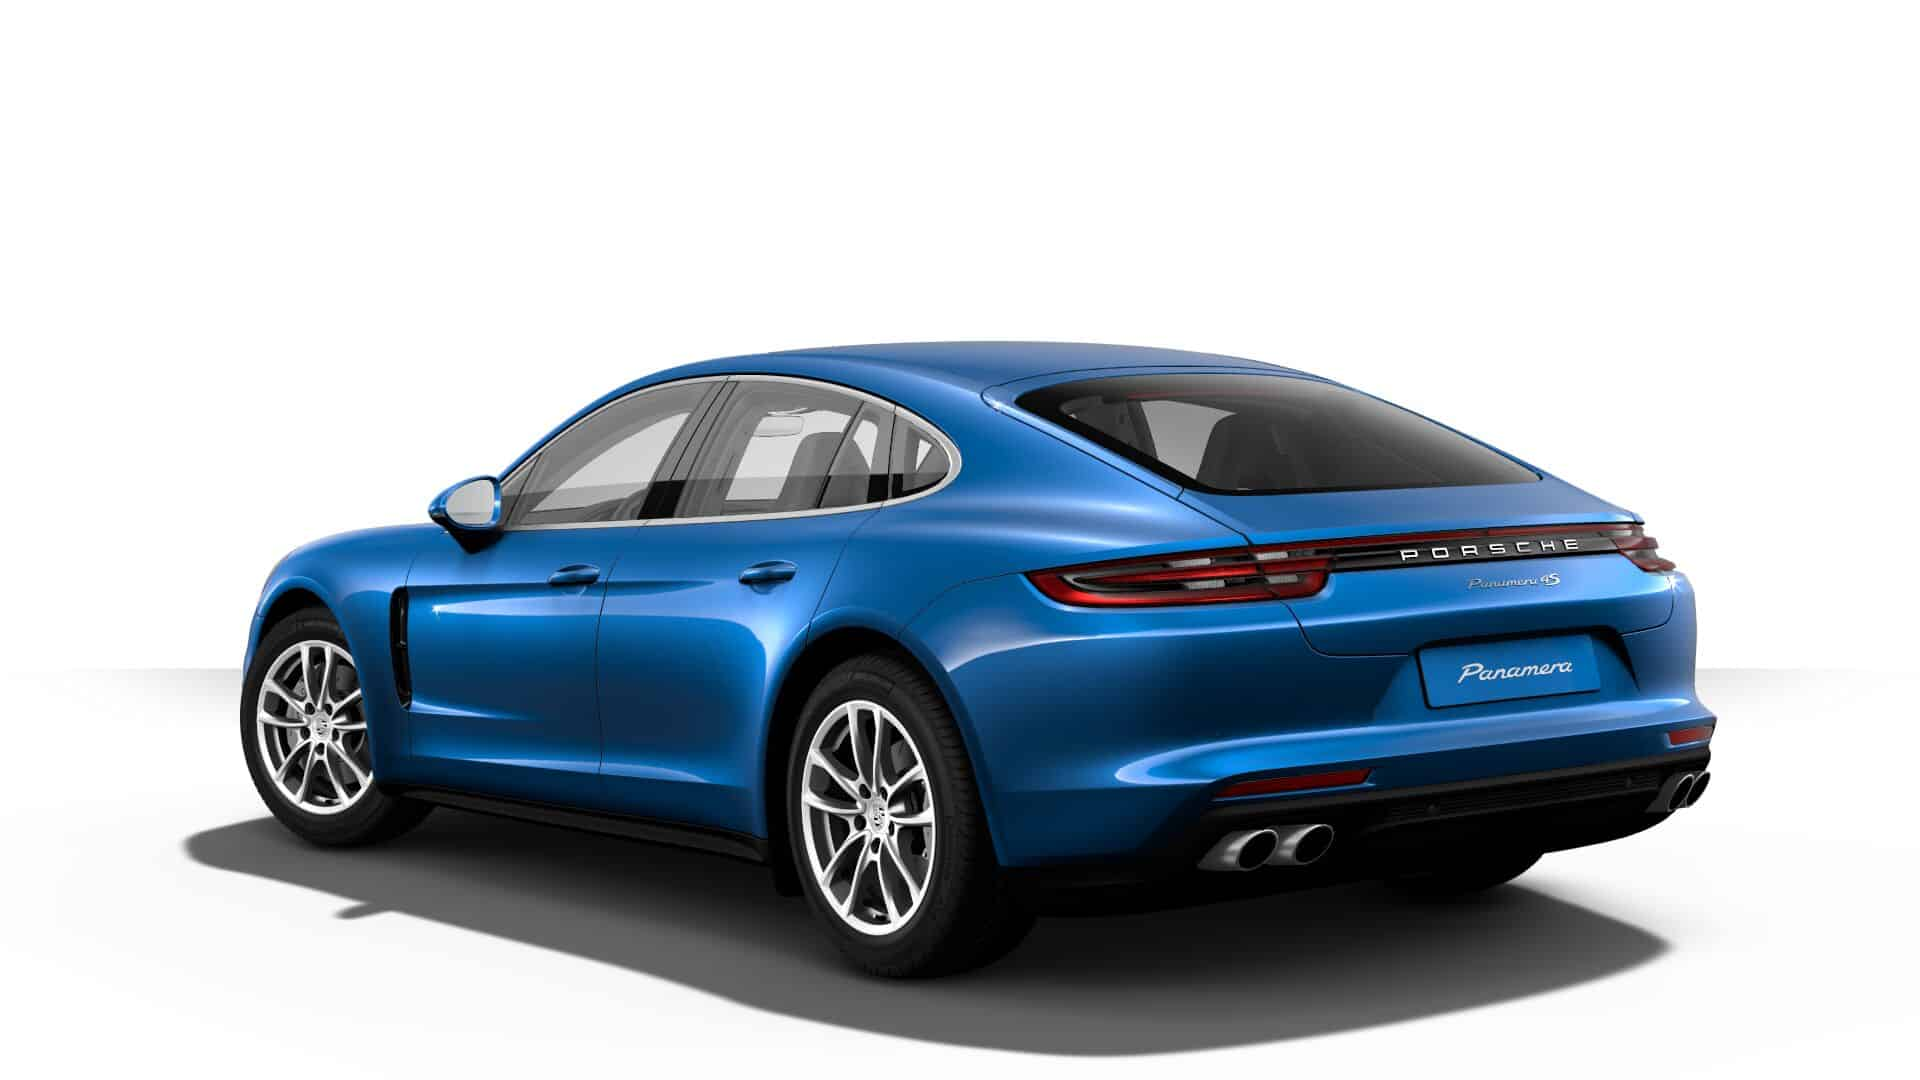 Porsche Panamera Best Luxury Cars: Rent A Porsche Panamera 4s